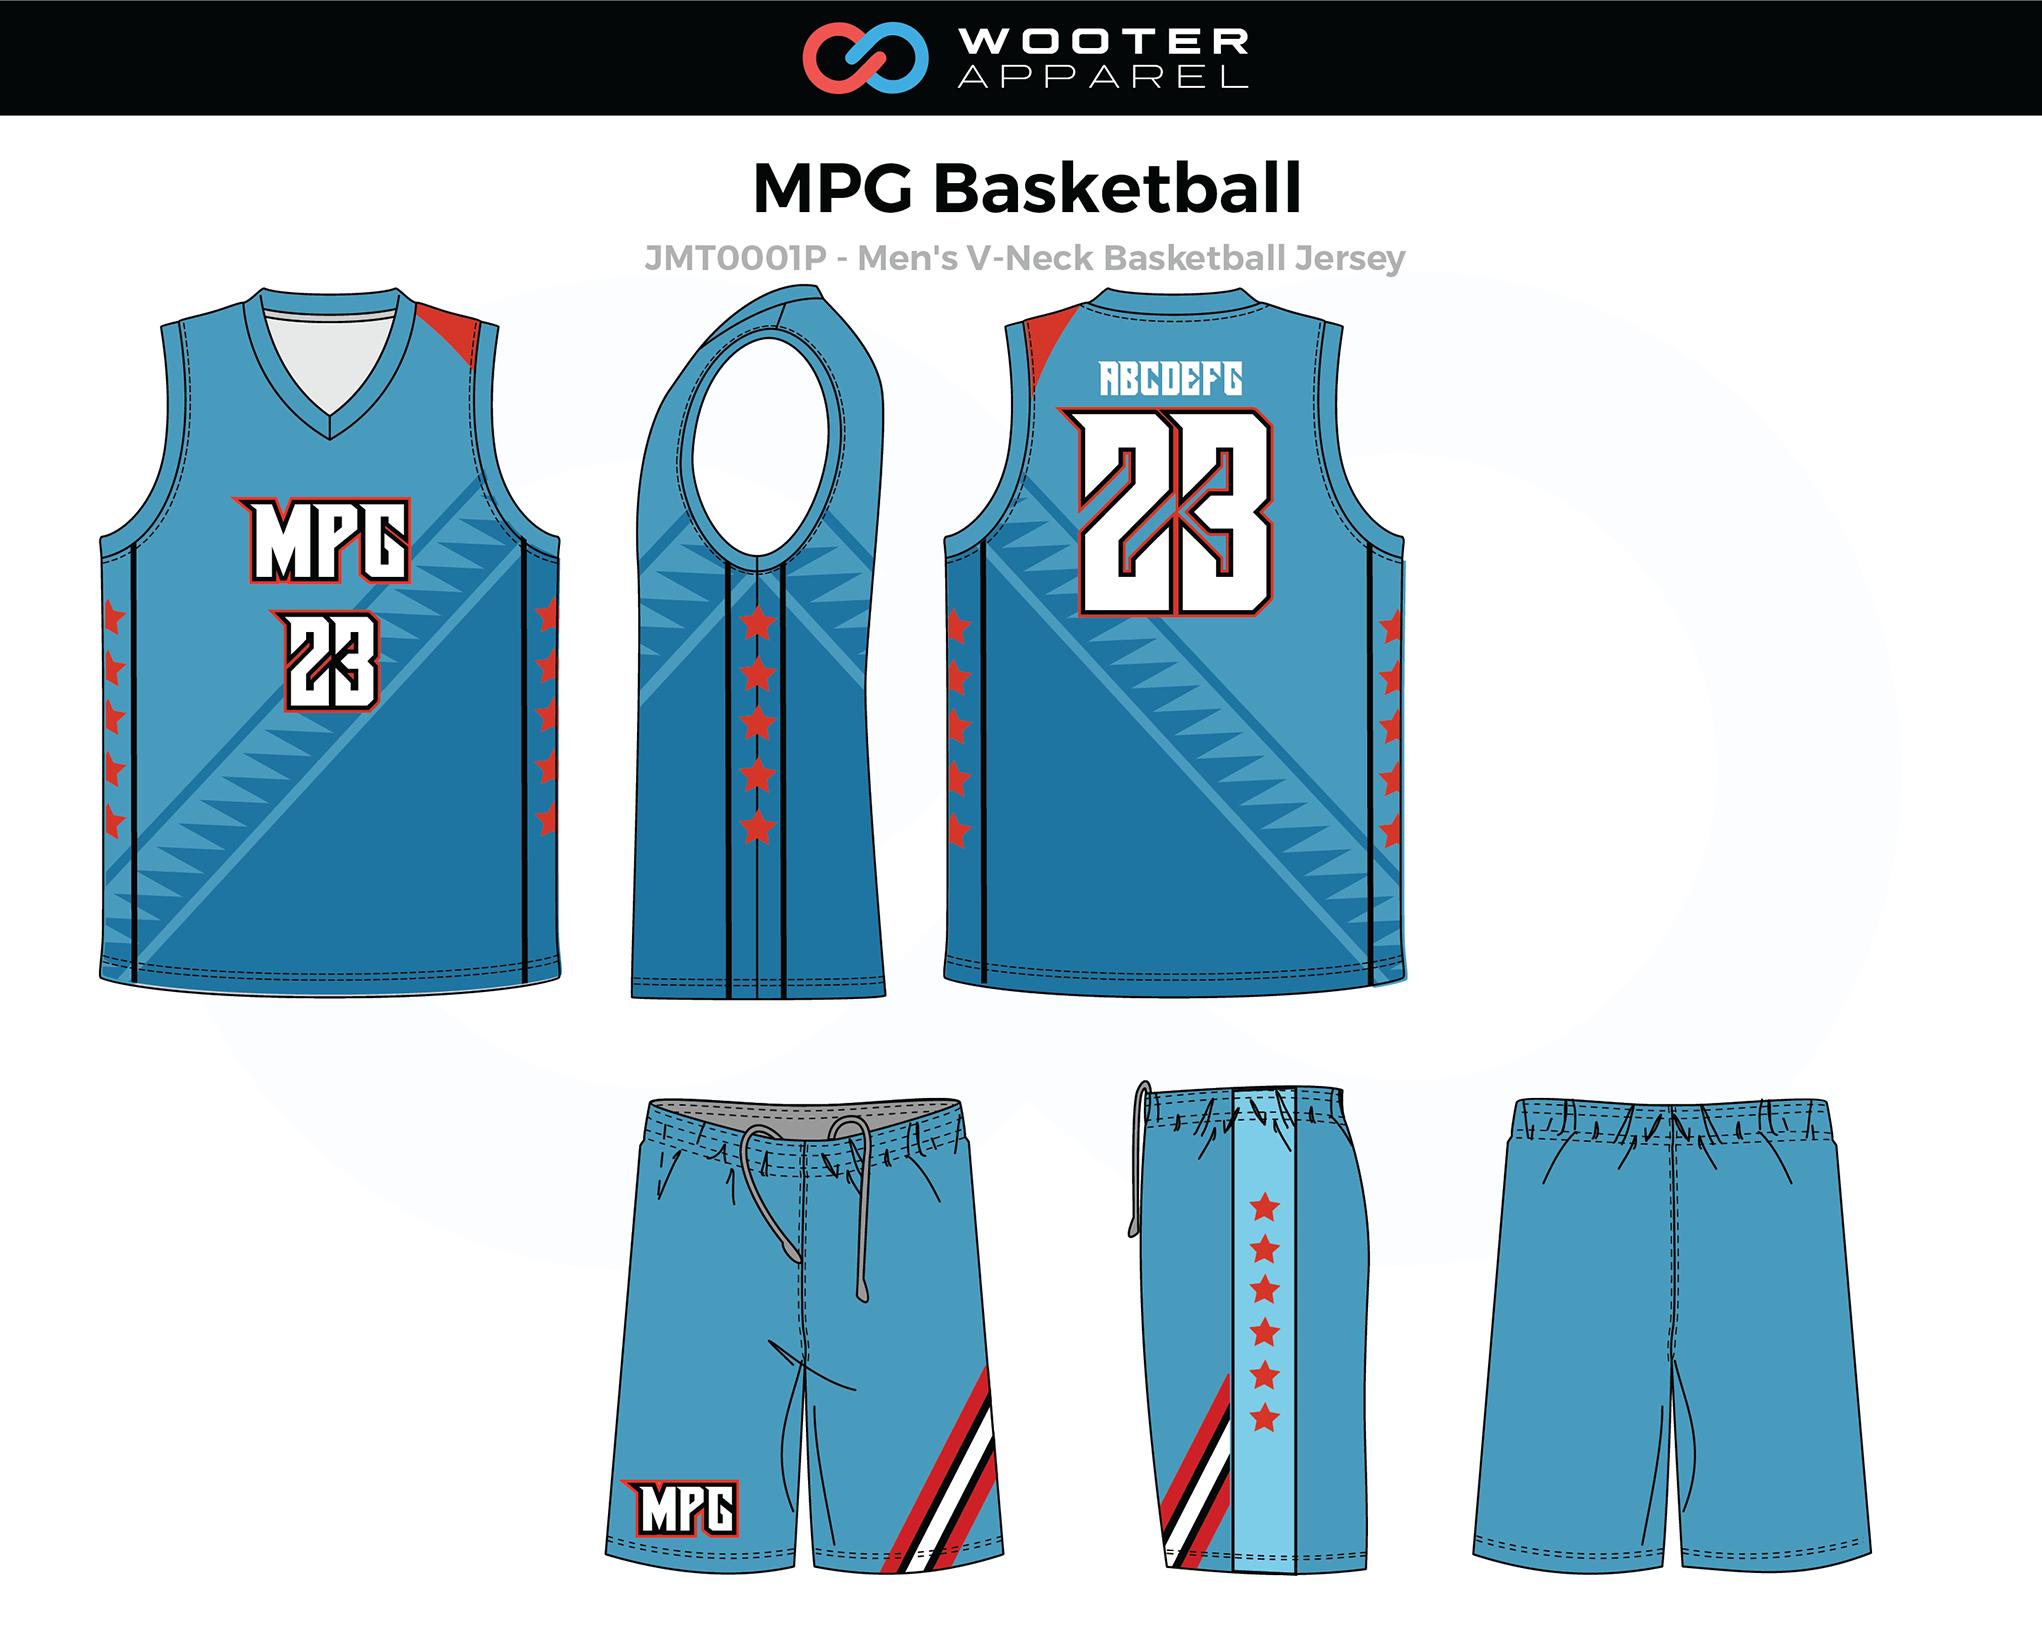 MPG Blue Red Men's V-Neck Basketball Uniform, Jersey and Shorts